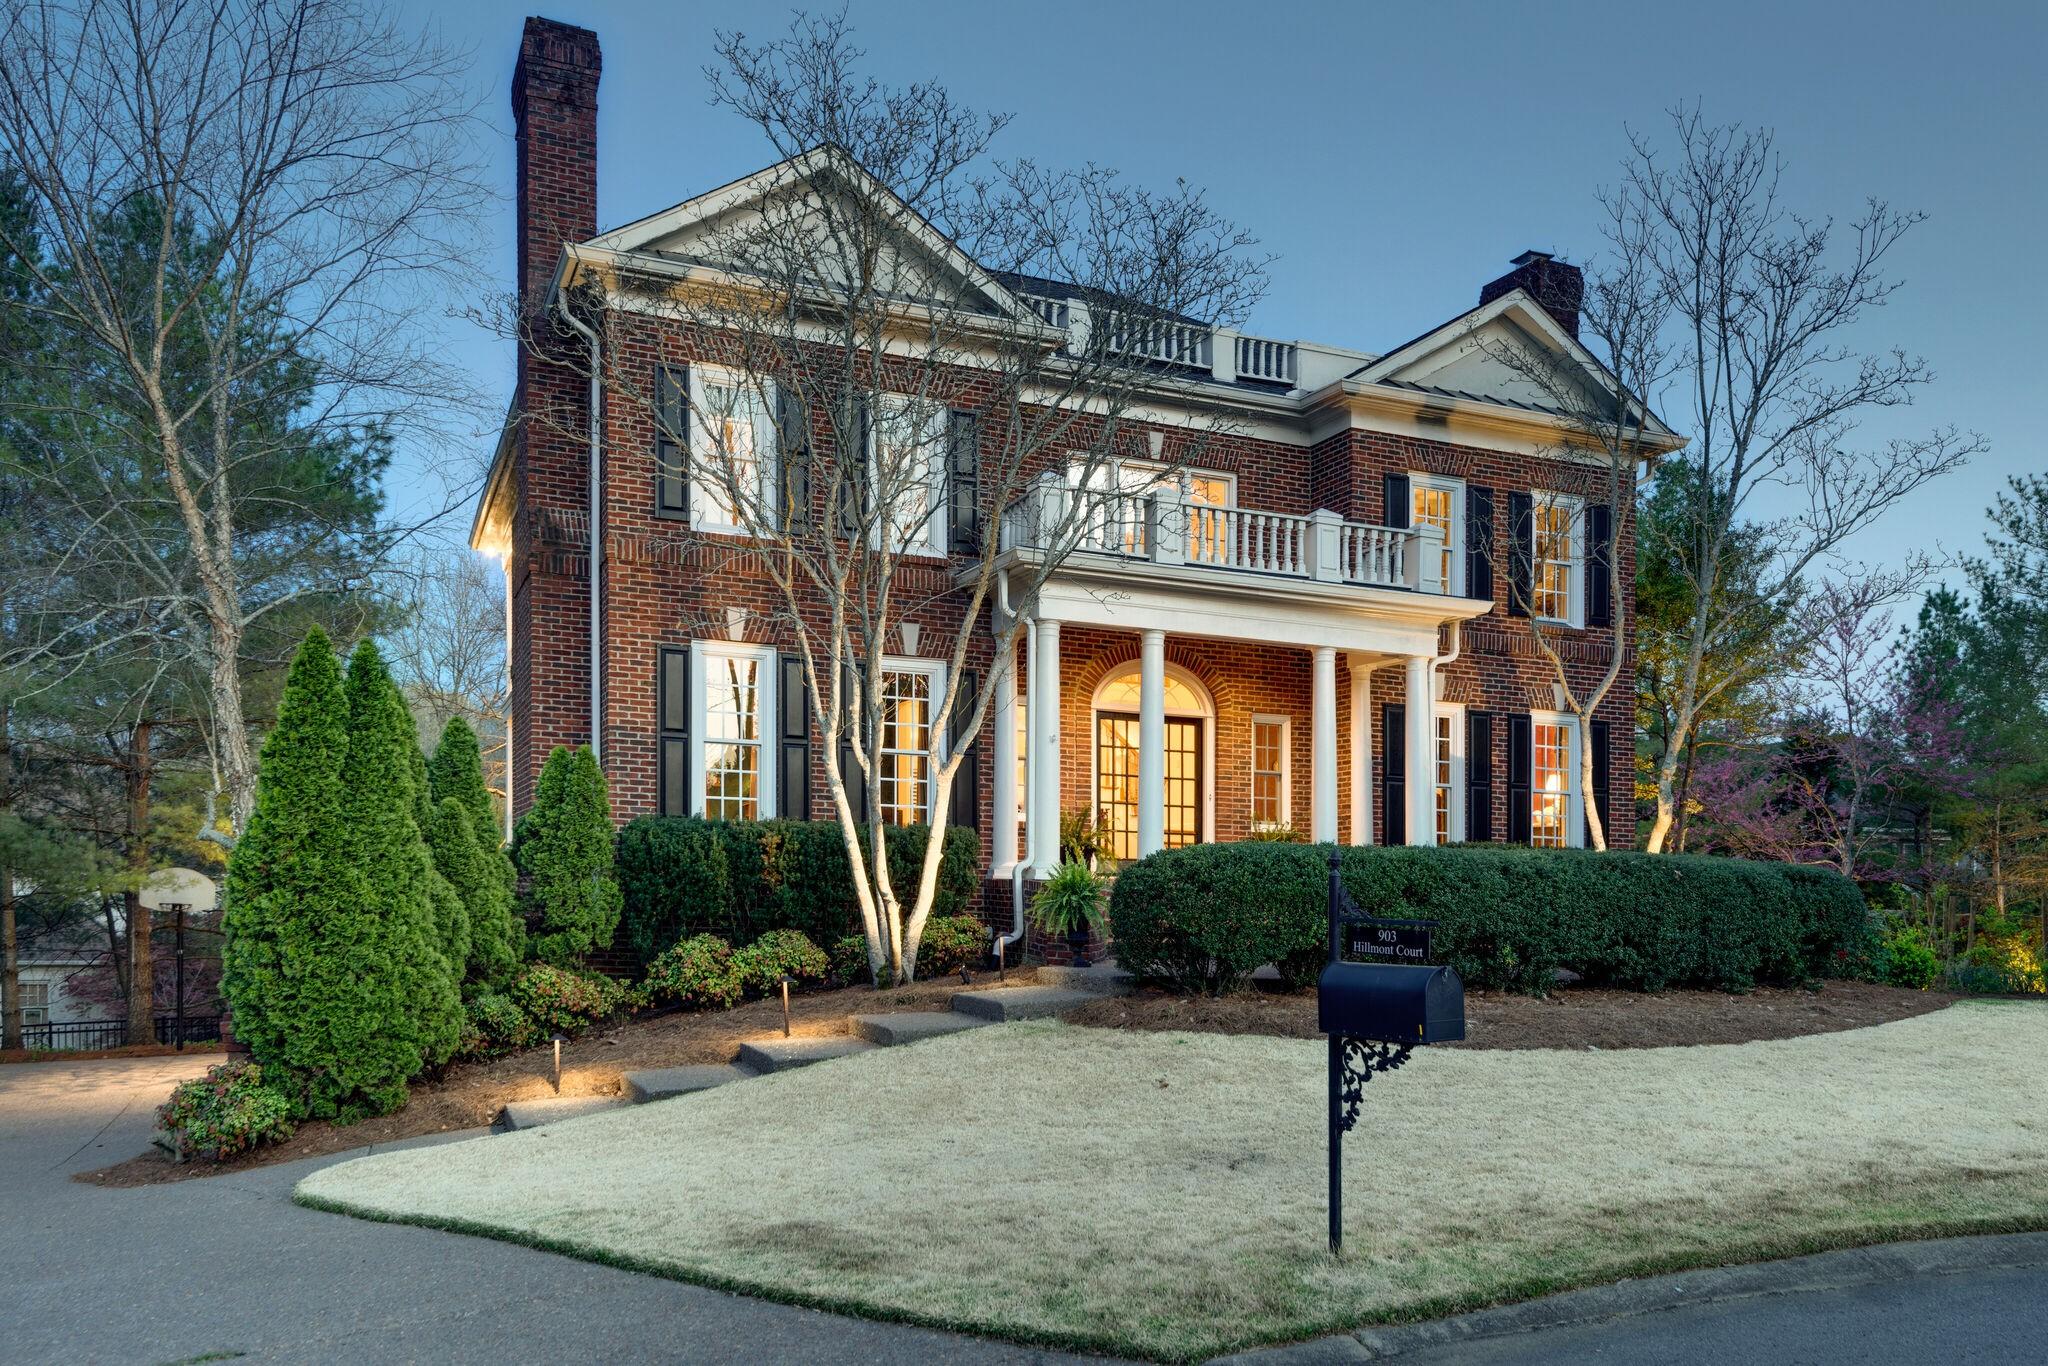 903 Hillmont Ct Property Photo - Nashville, TN real estate listing